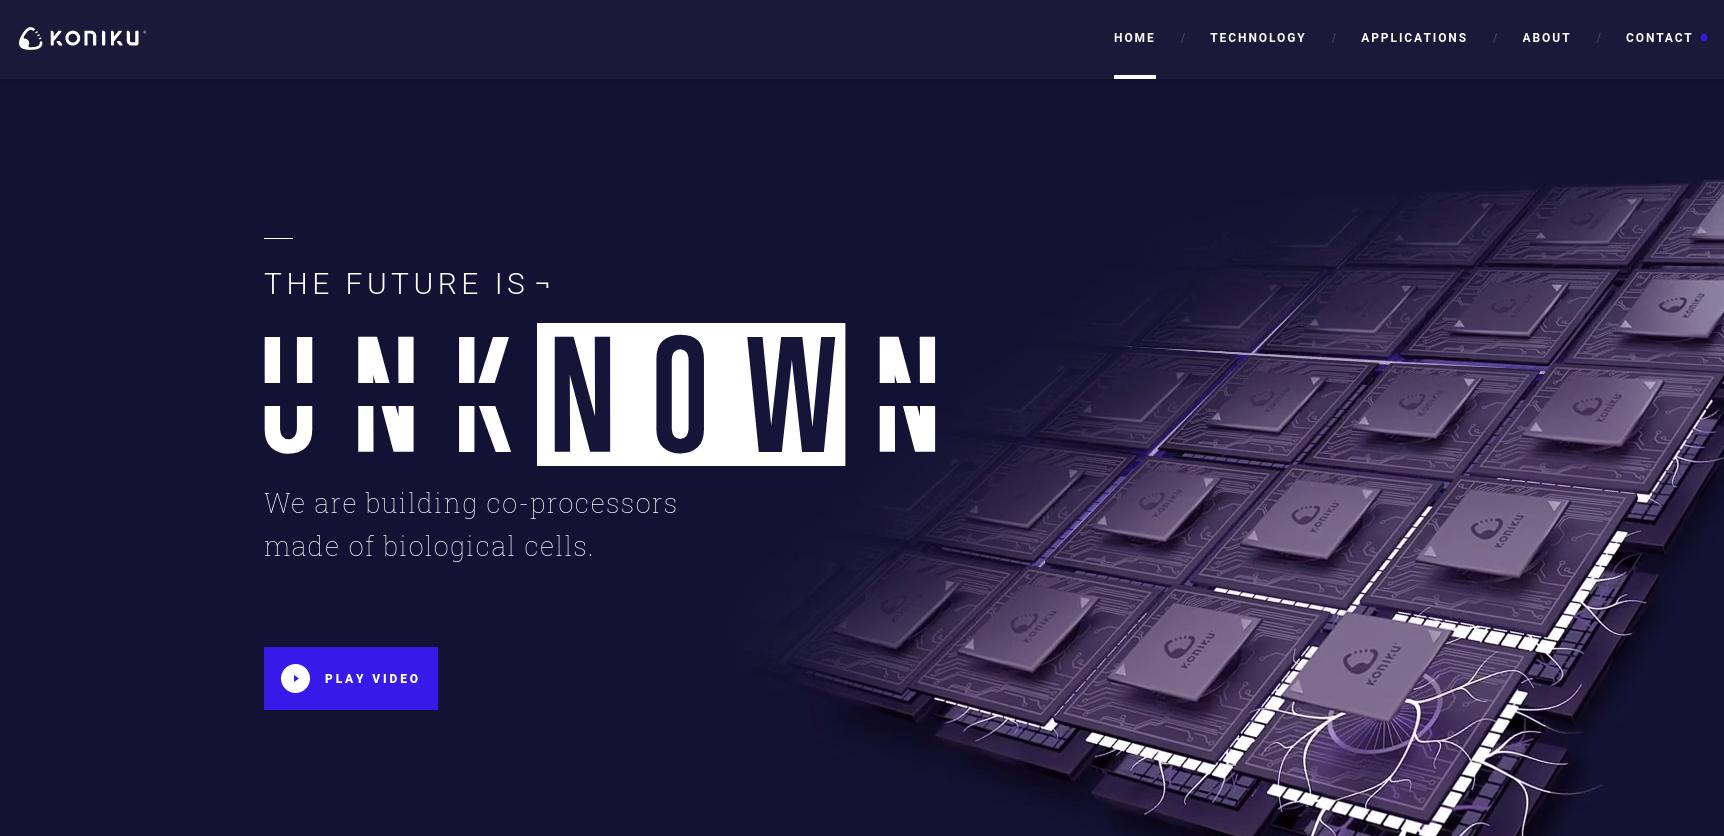 Data Visualisation In Website Design